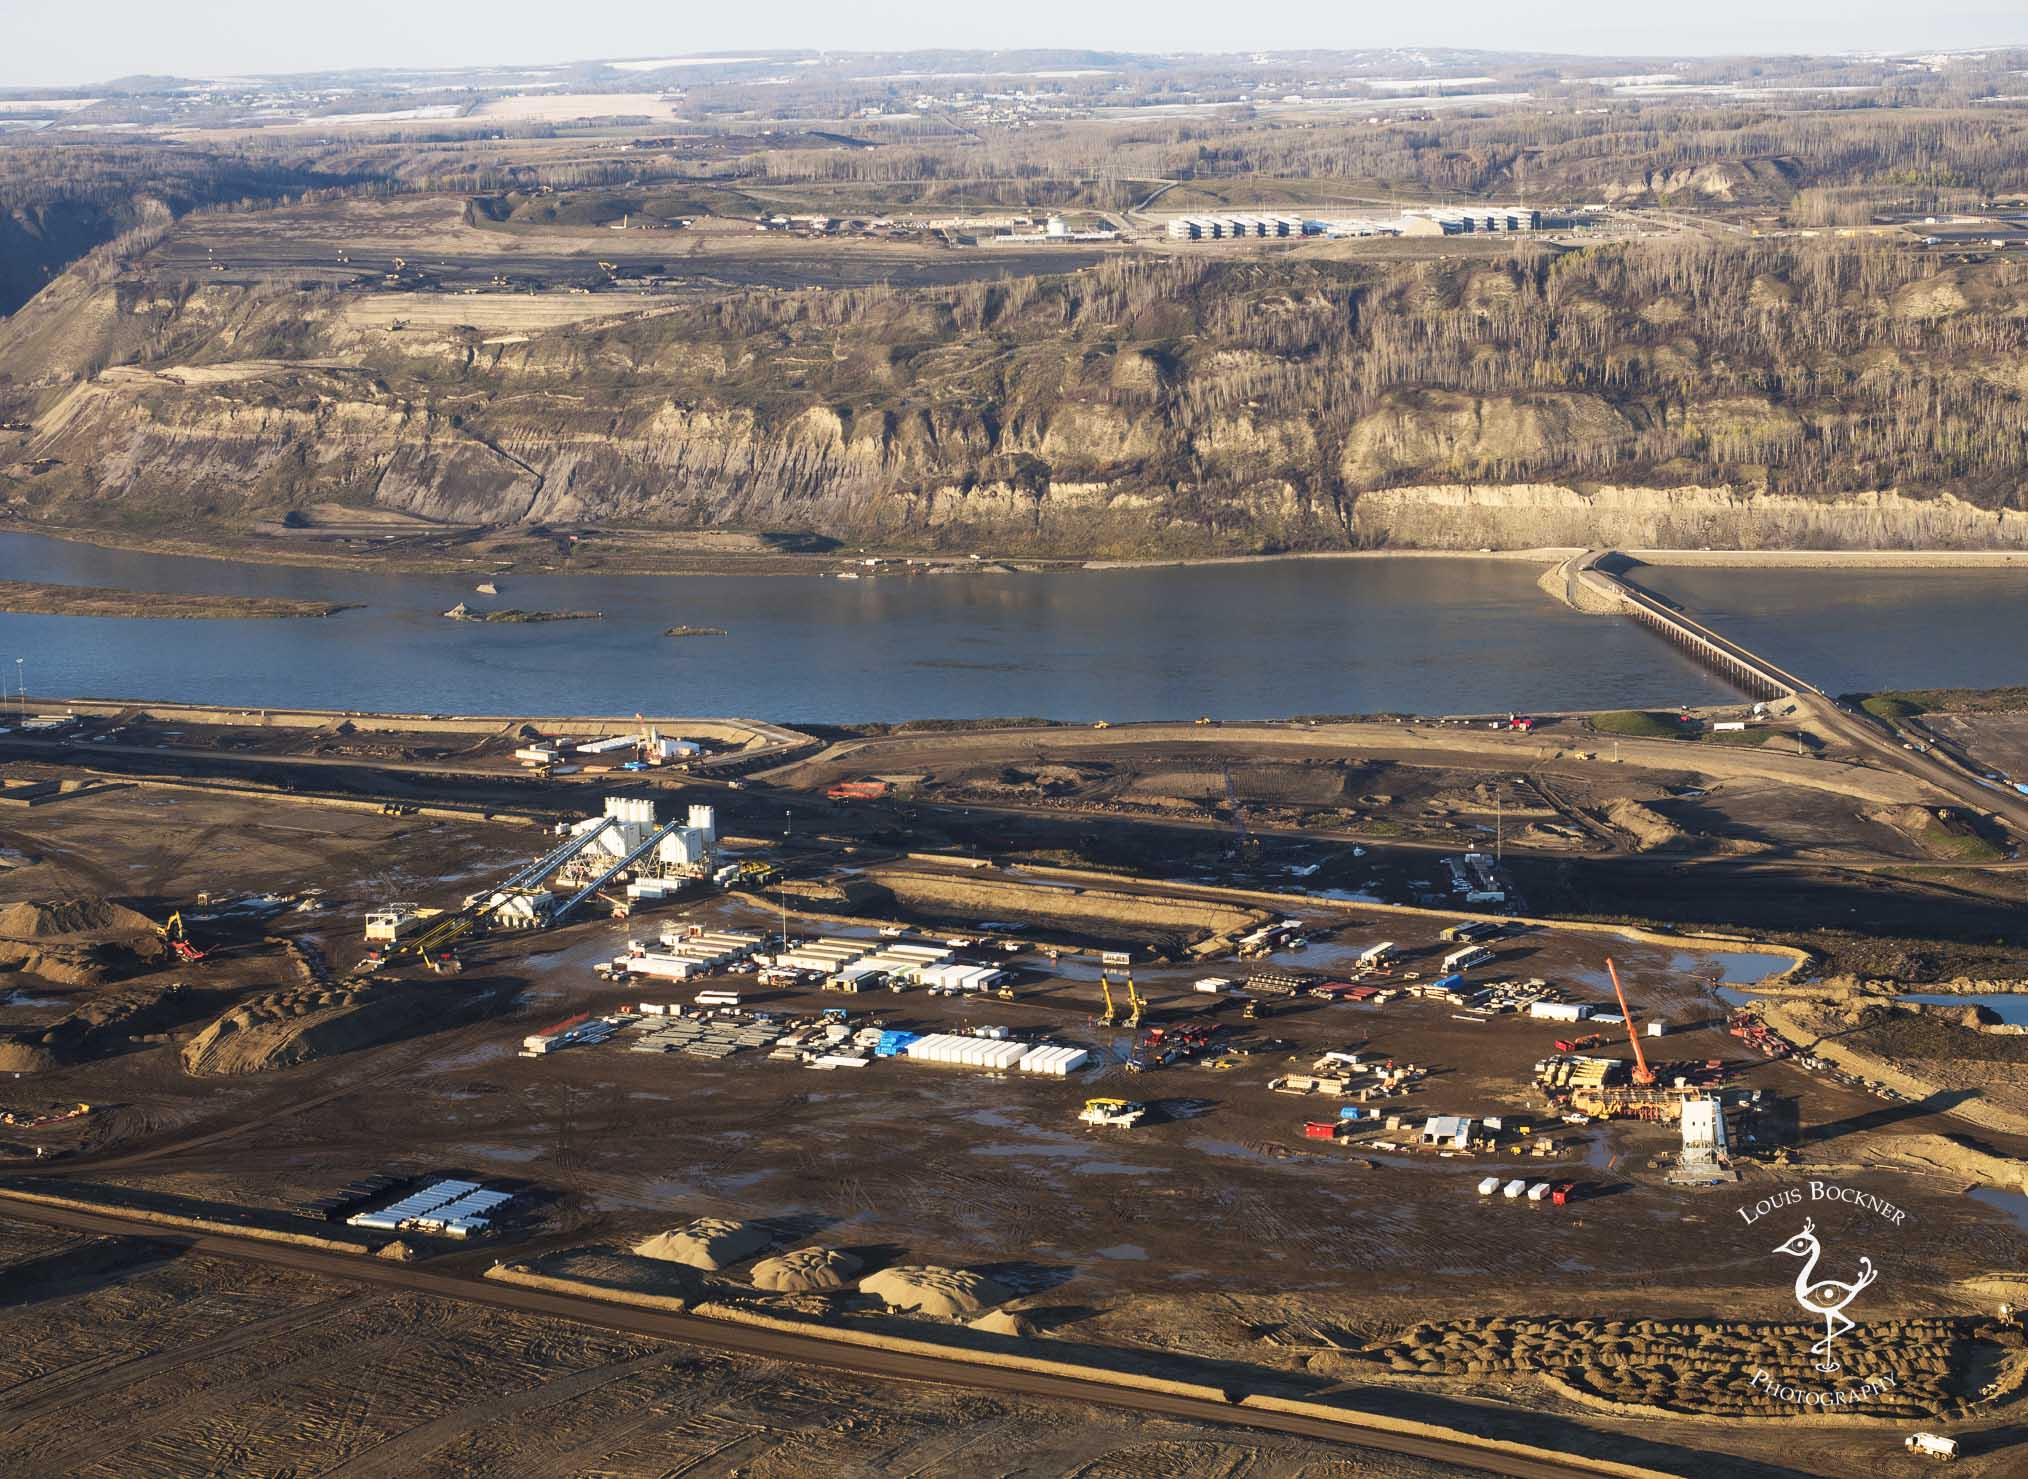 Site C dam construction camp. Photo by Louis Bockner.